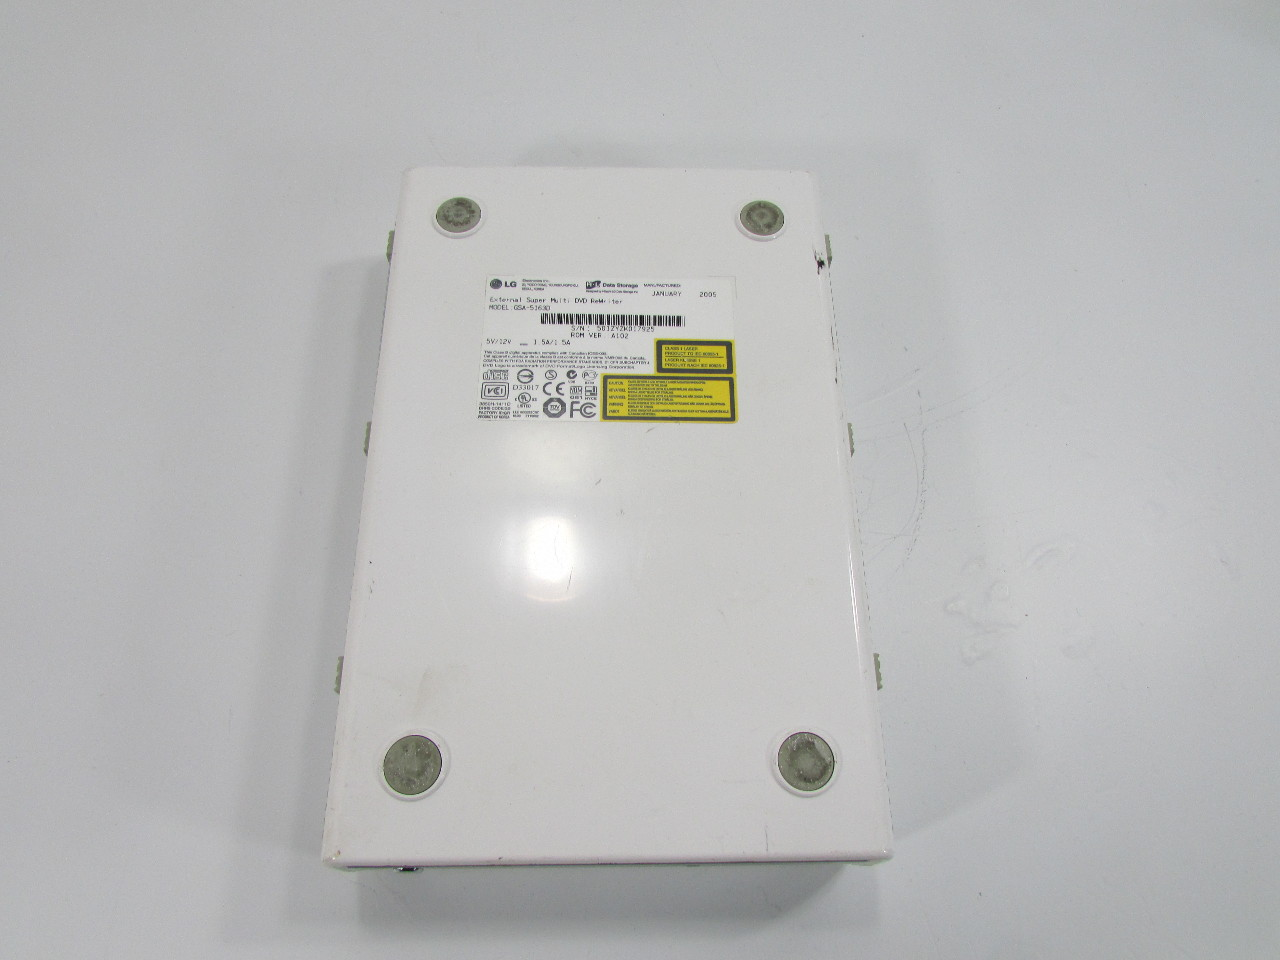 New LG Cd-Rw & DVD-Rw drivers